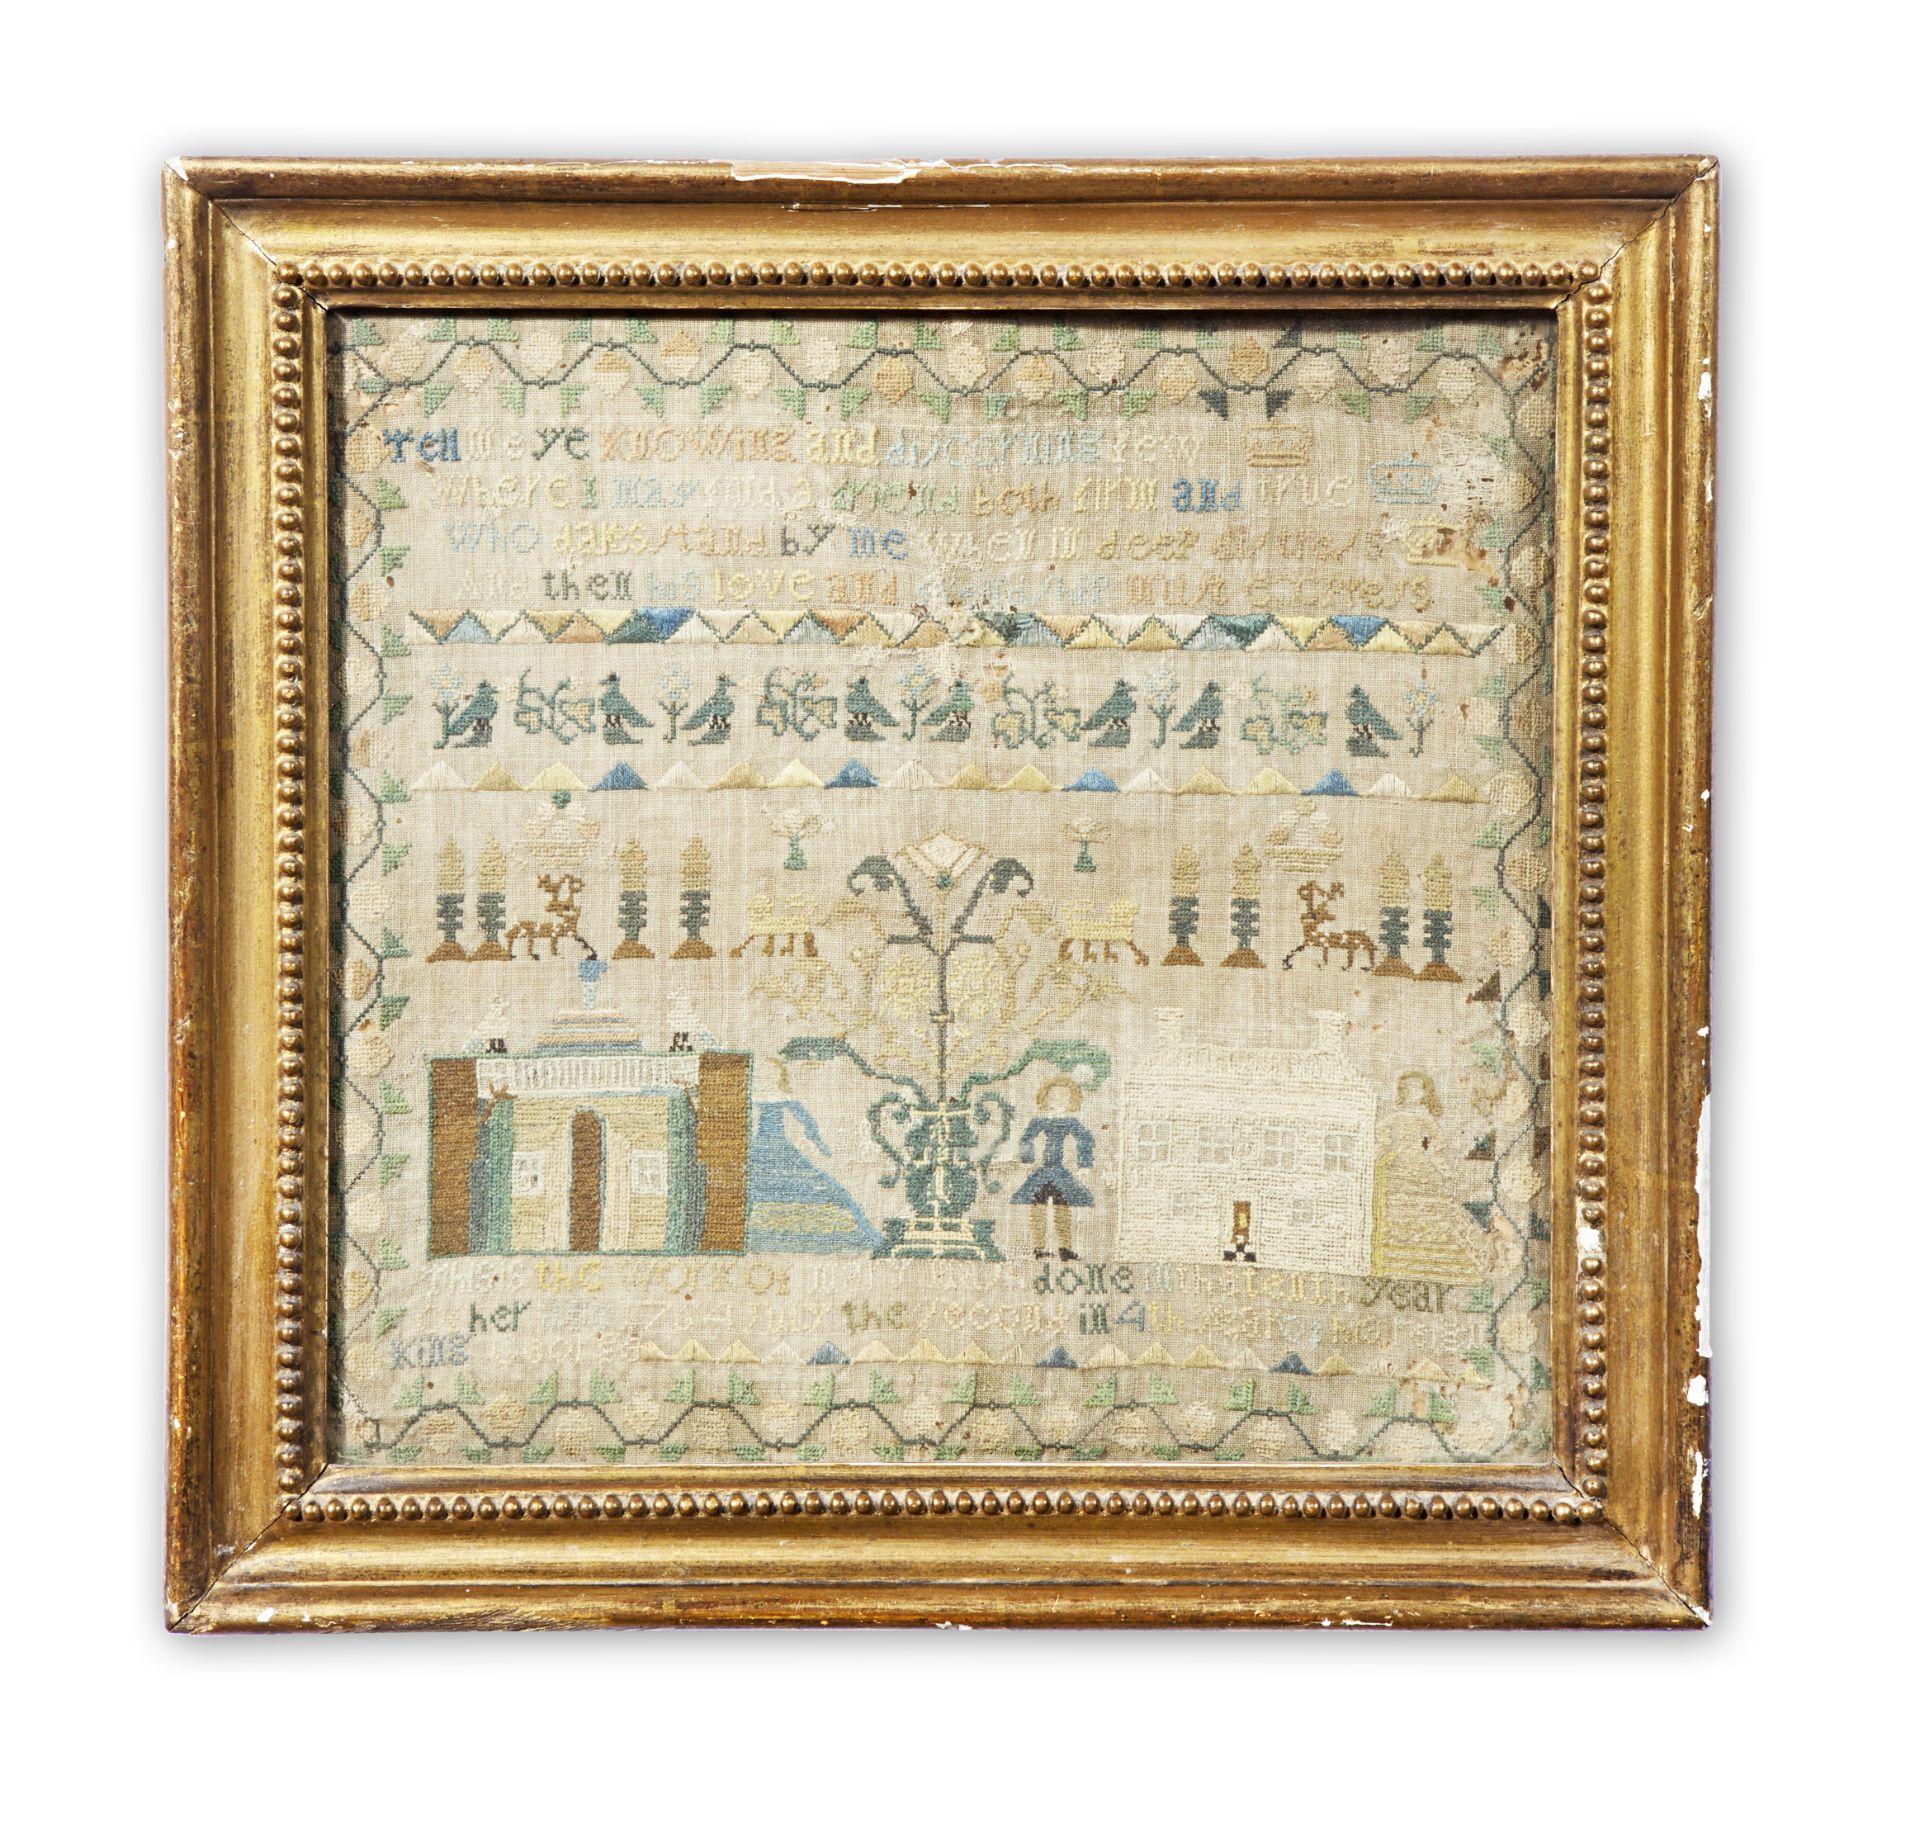 Los 227 - A George III needlework sampler, framed, dated 1764